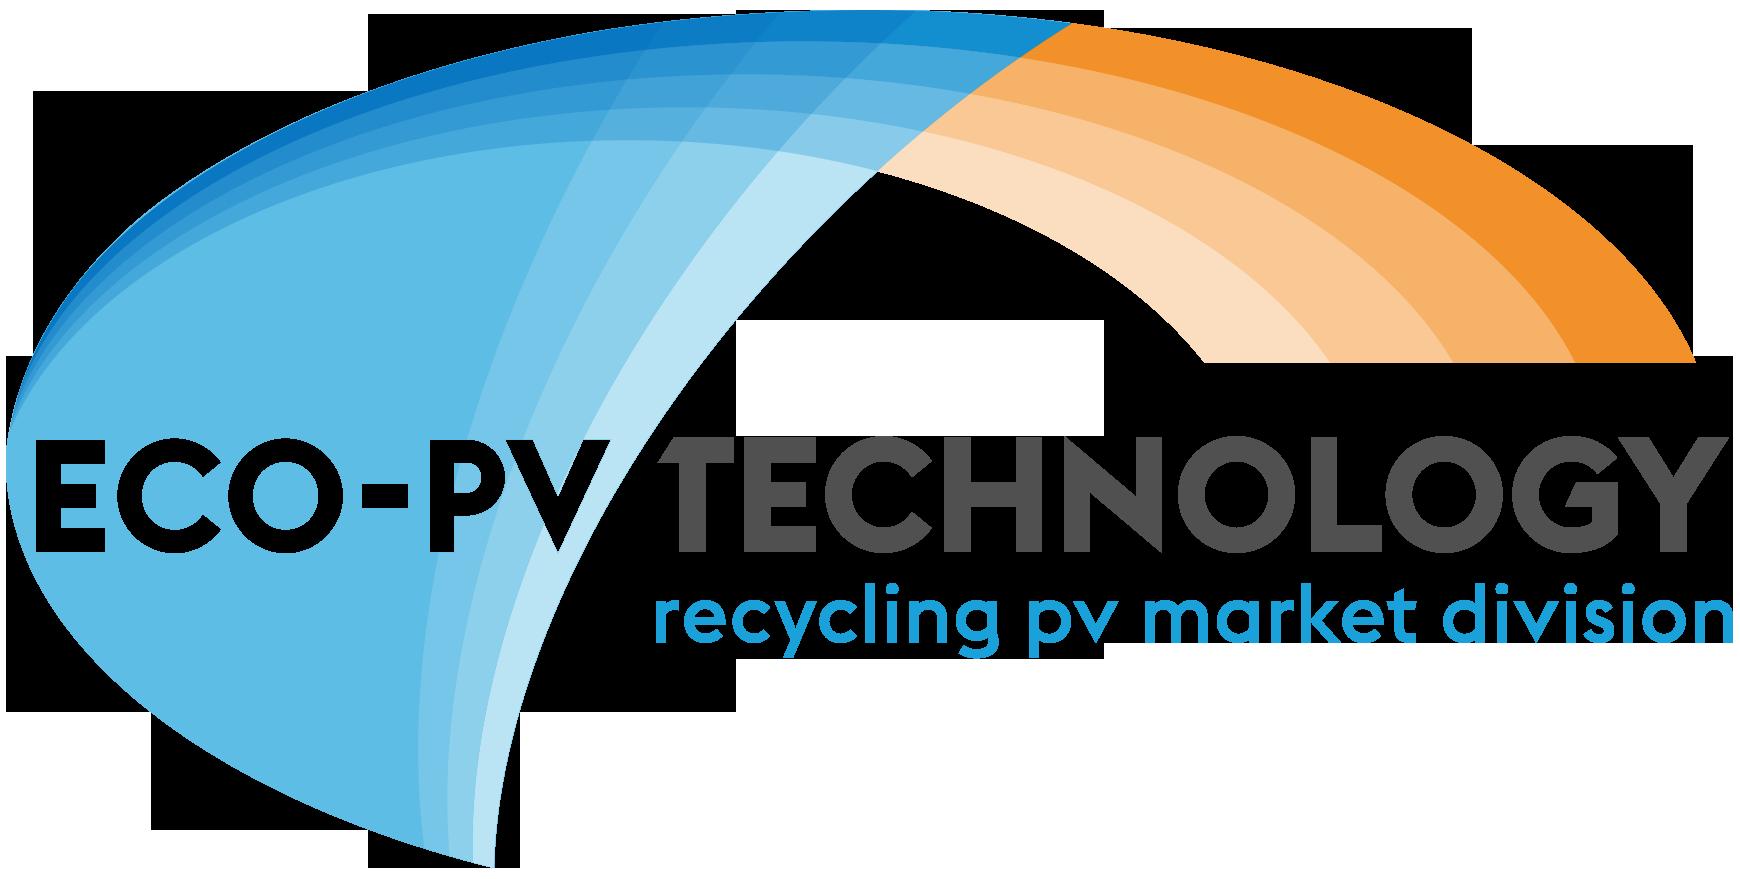 LOGO ECO-PV TECHNOLOGY